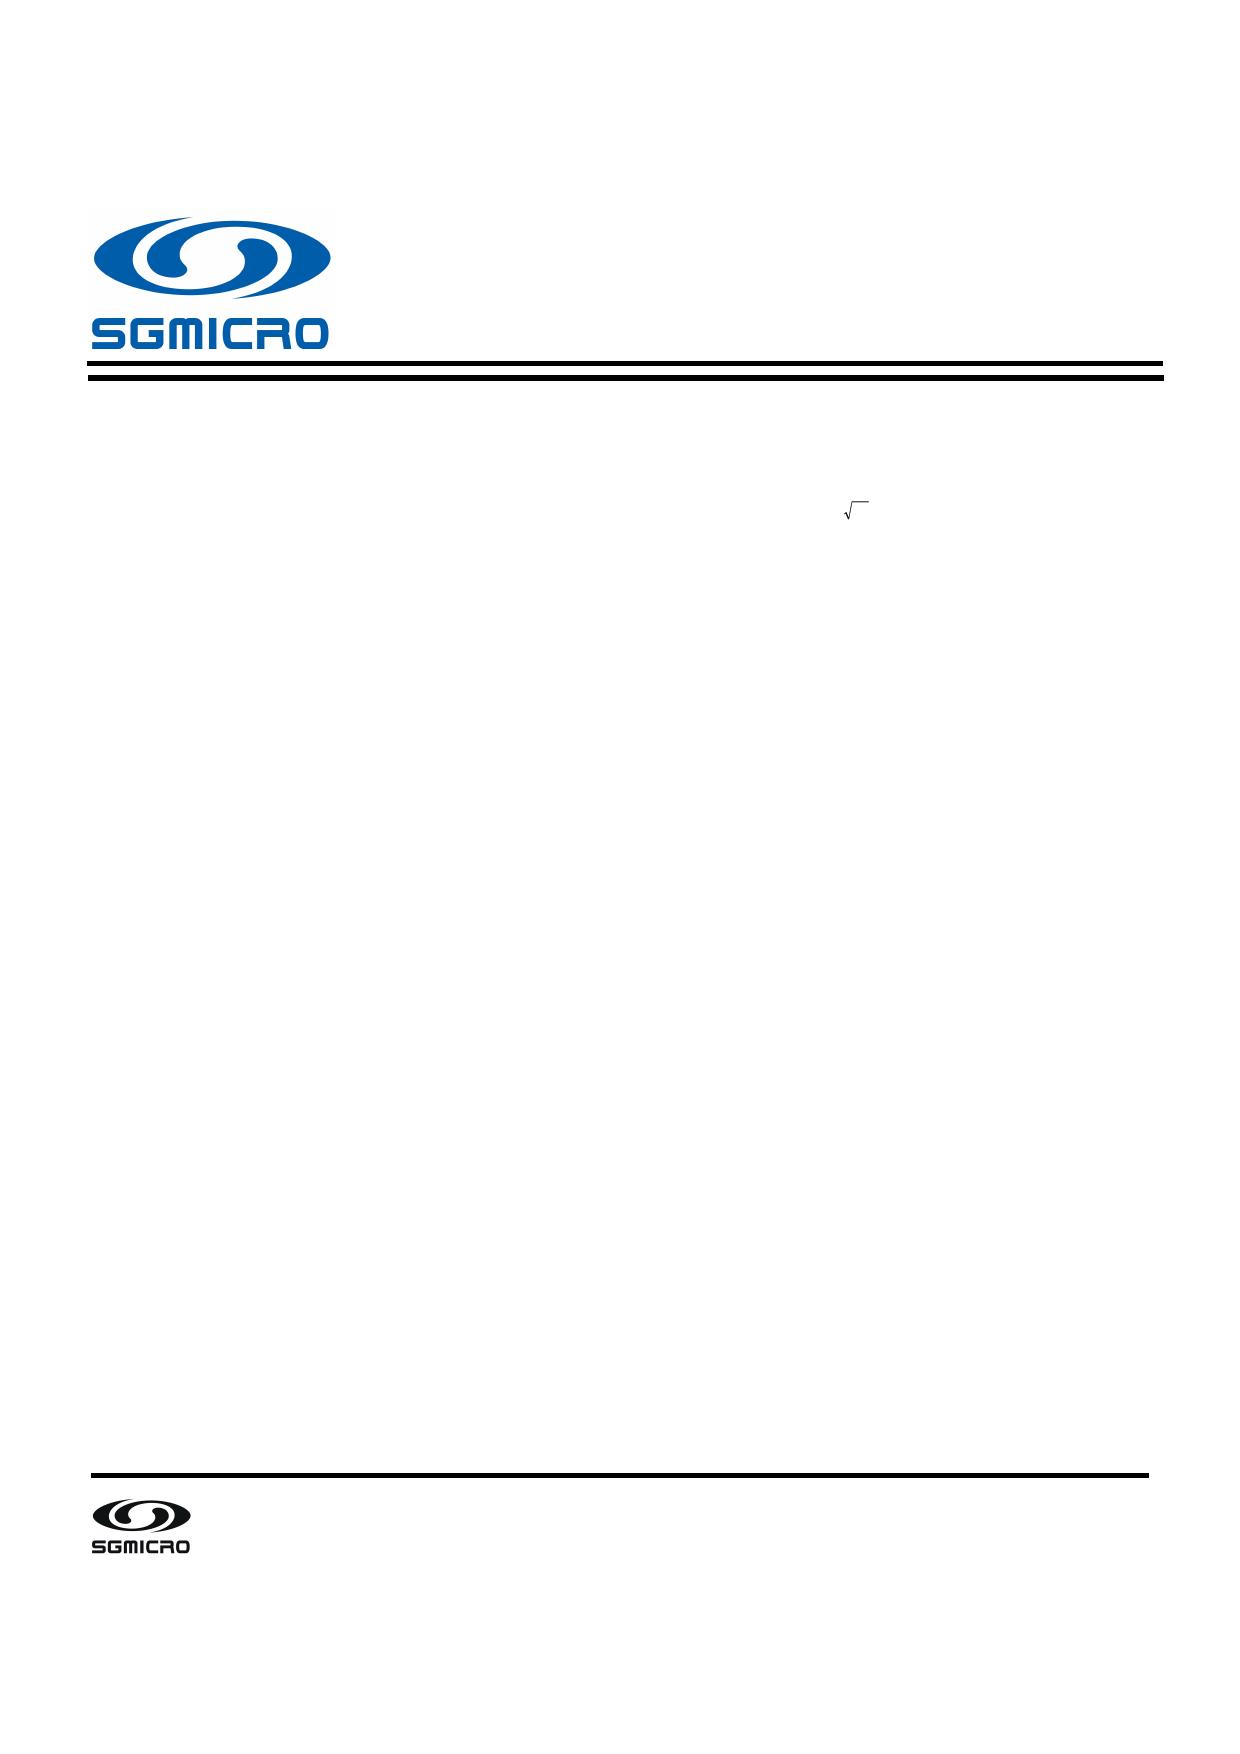 SGM8941 datasheet, circuit